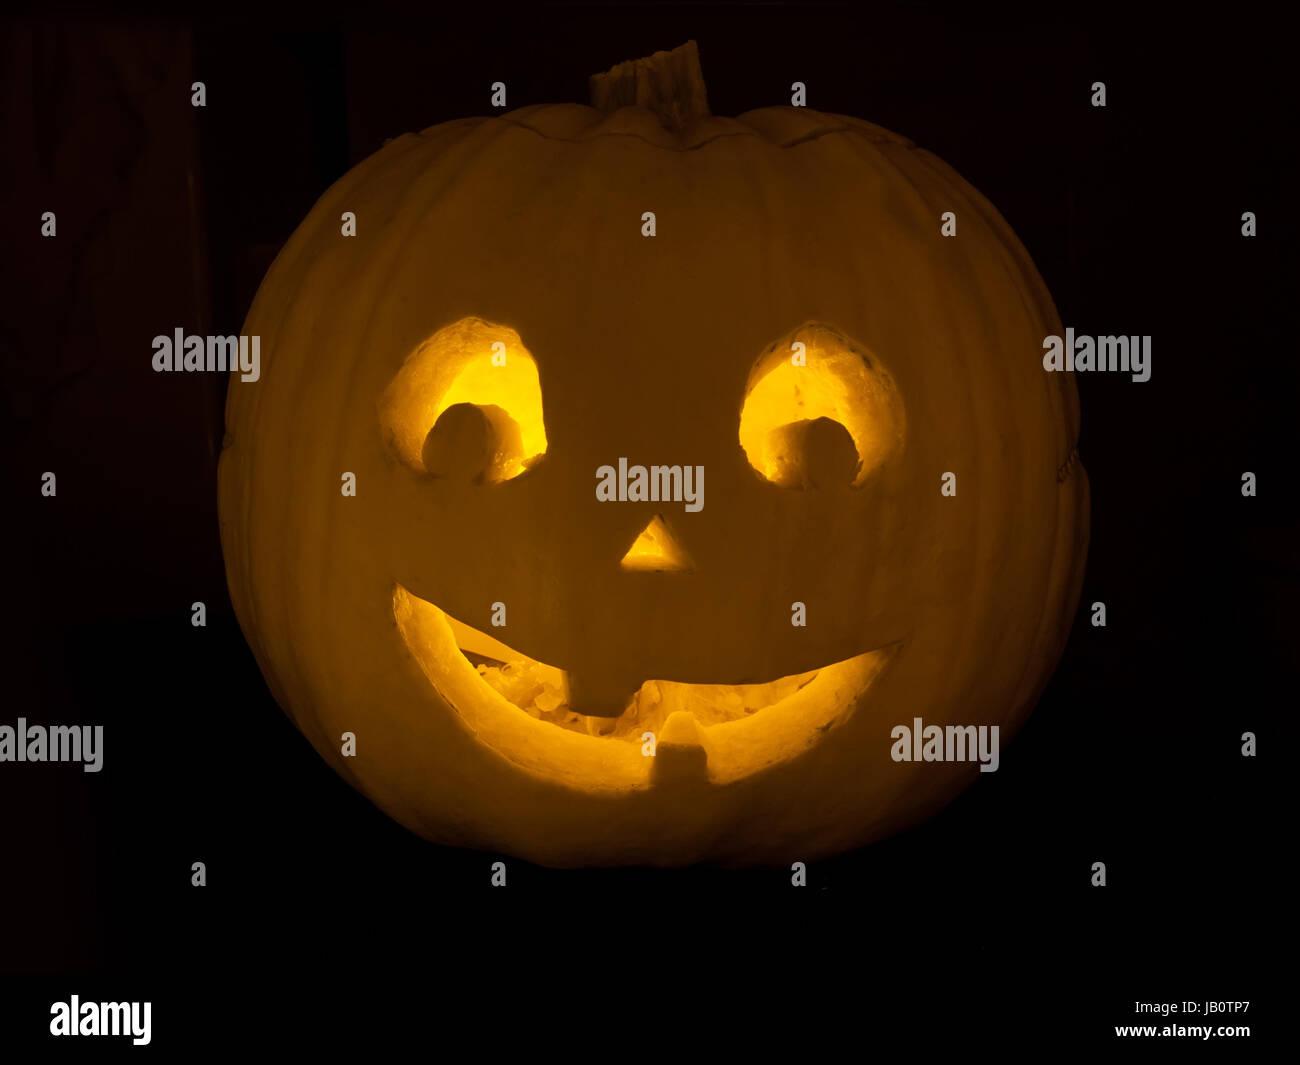 Cute Jack O Lantern Halloween Pumpkin With Candle Light Stock Photo Alamy